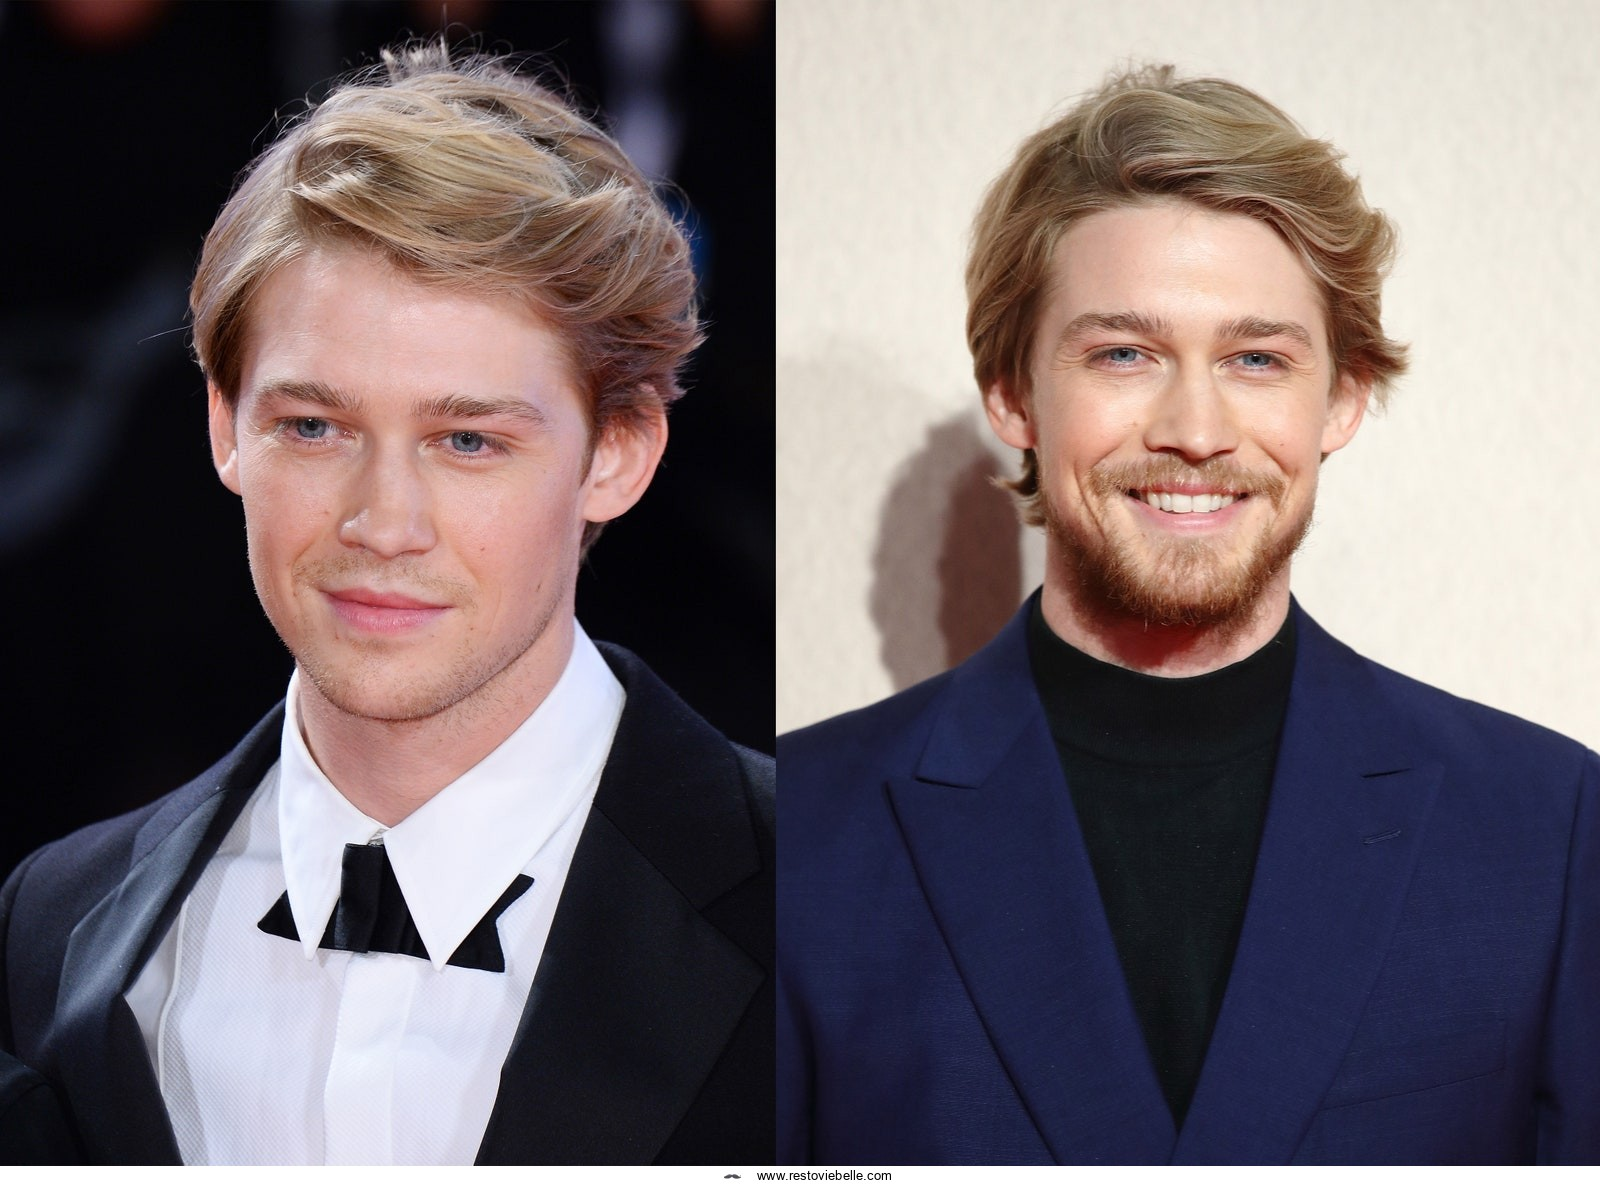 clean shaven vs beard